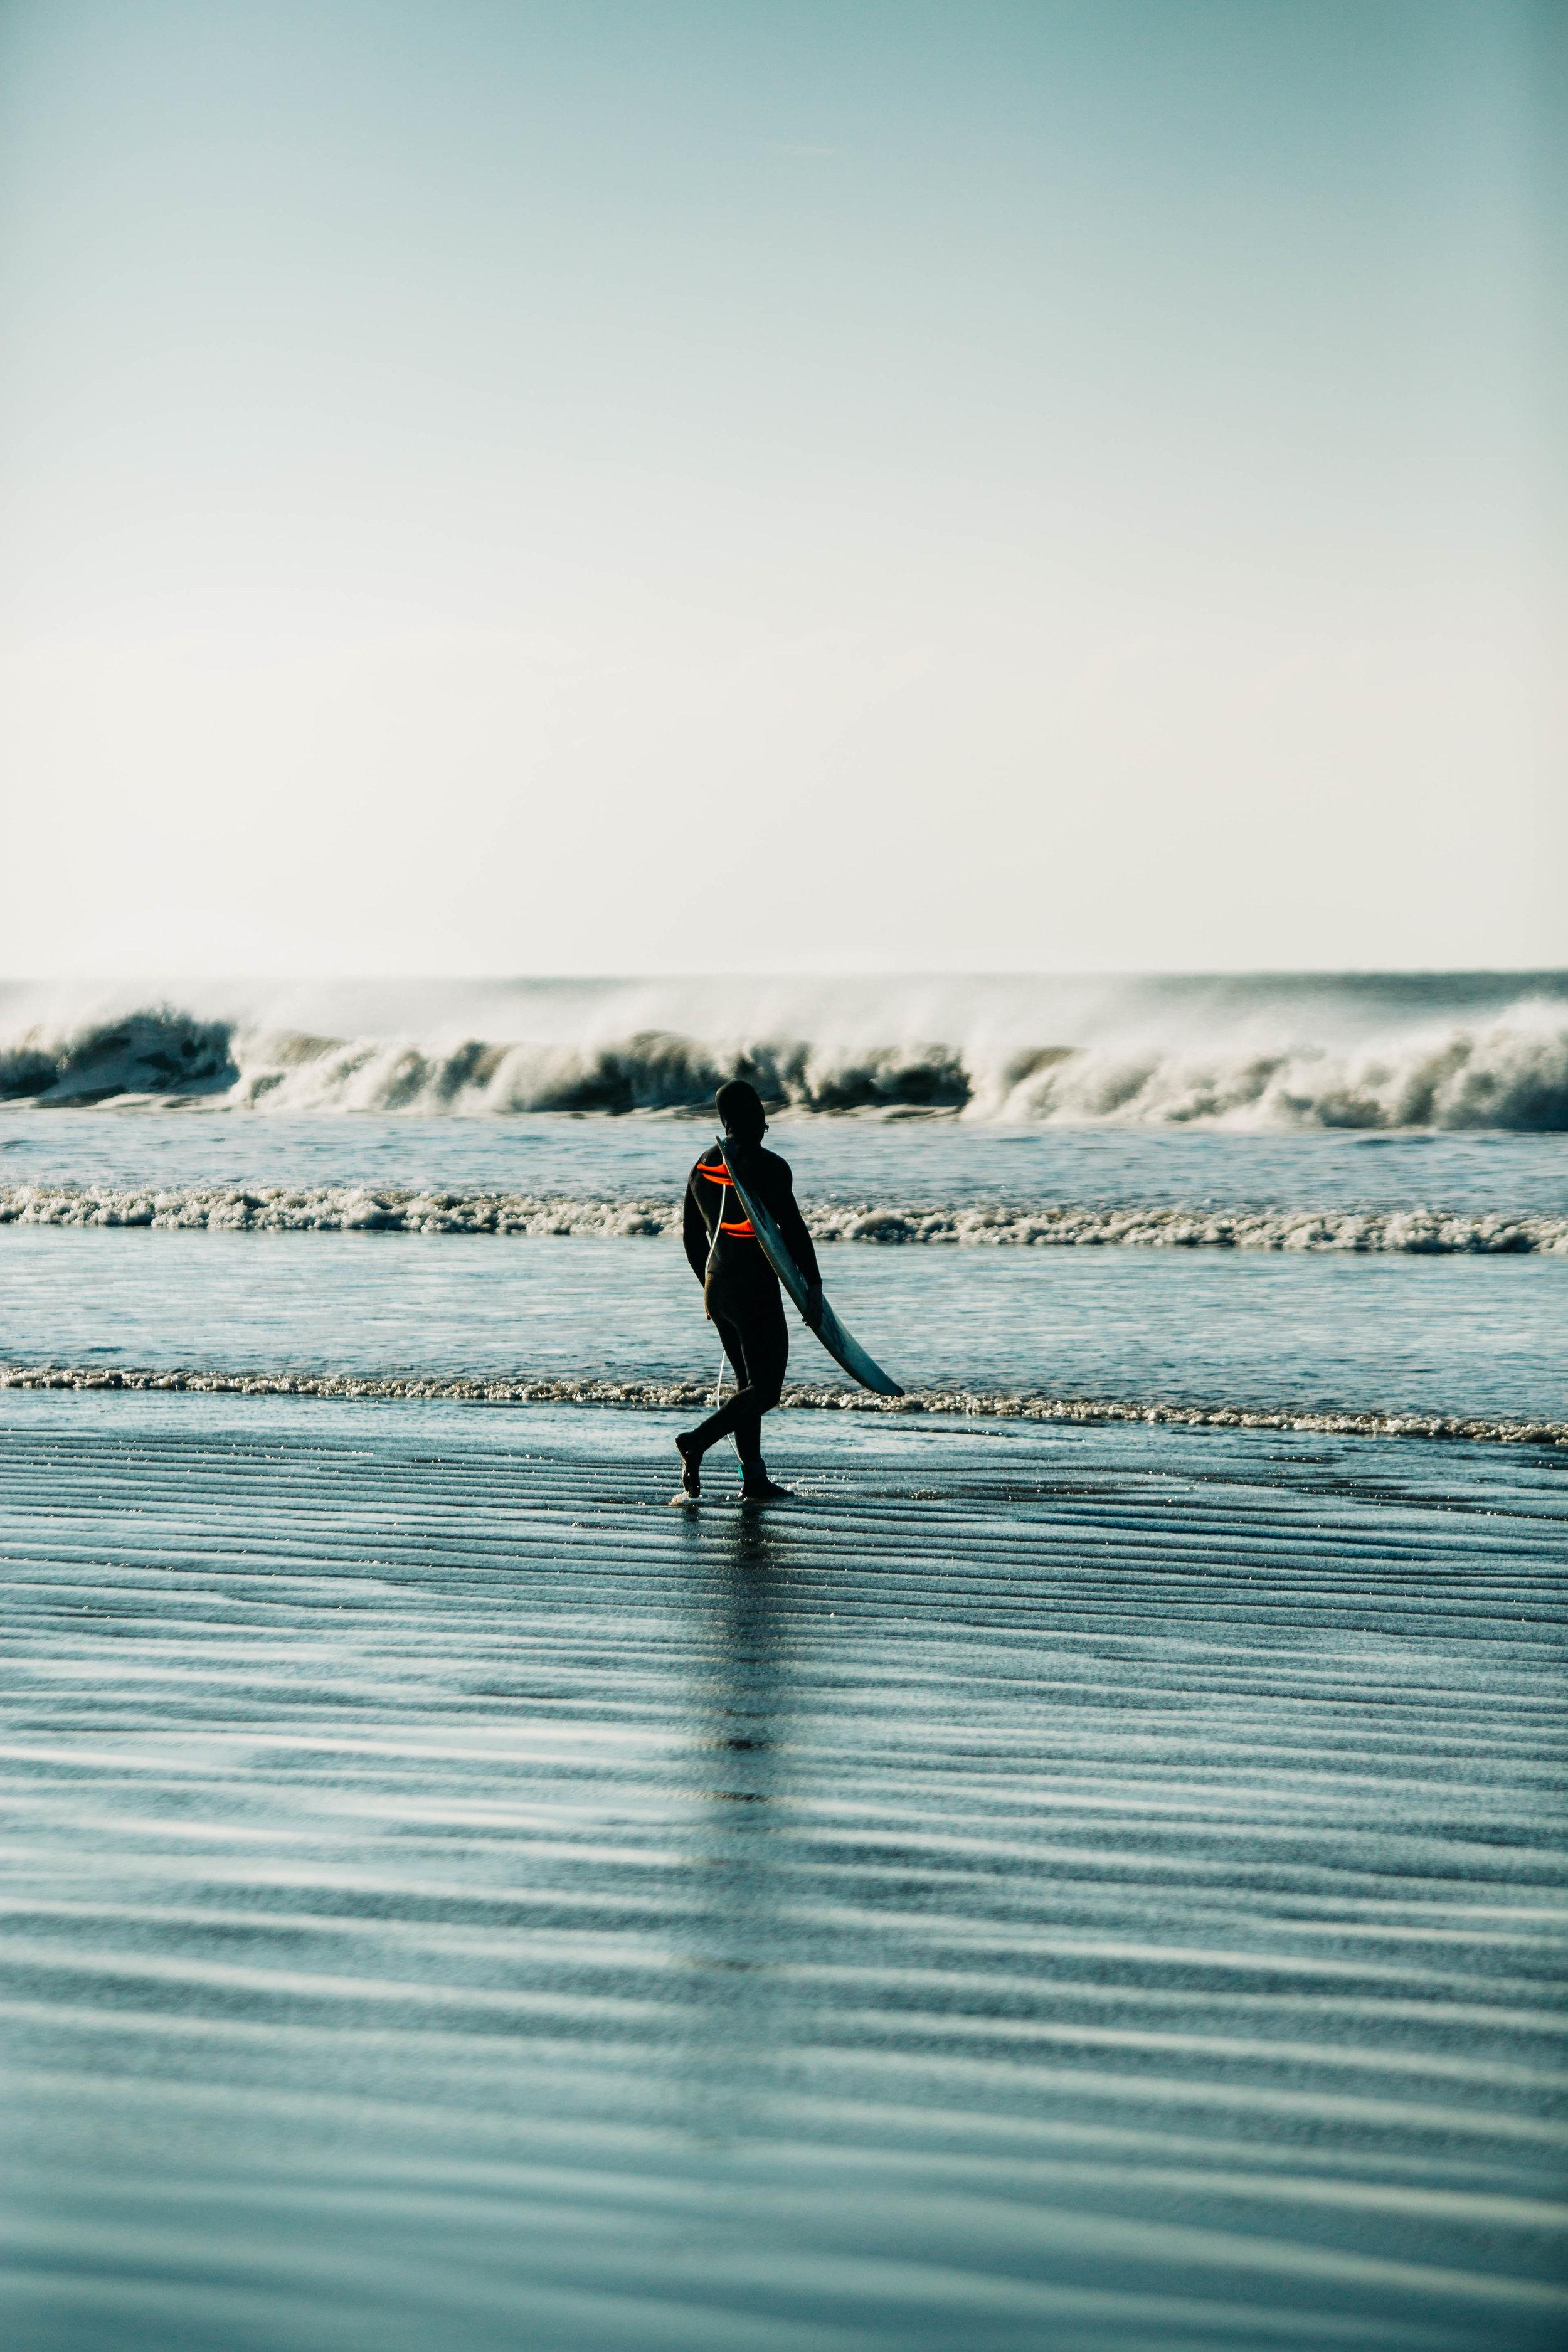 Alex_Sedgmond_Photography-Cardiff-SouthWales-PorthcawlRestbay-Surfing-EzraHames-54.jpg